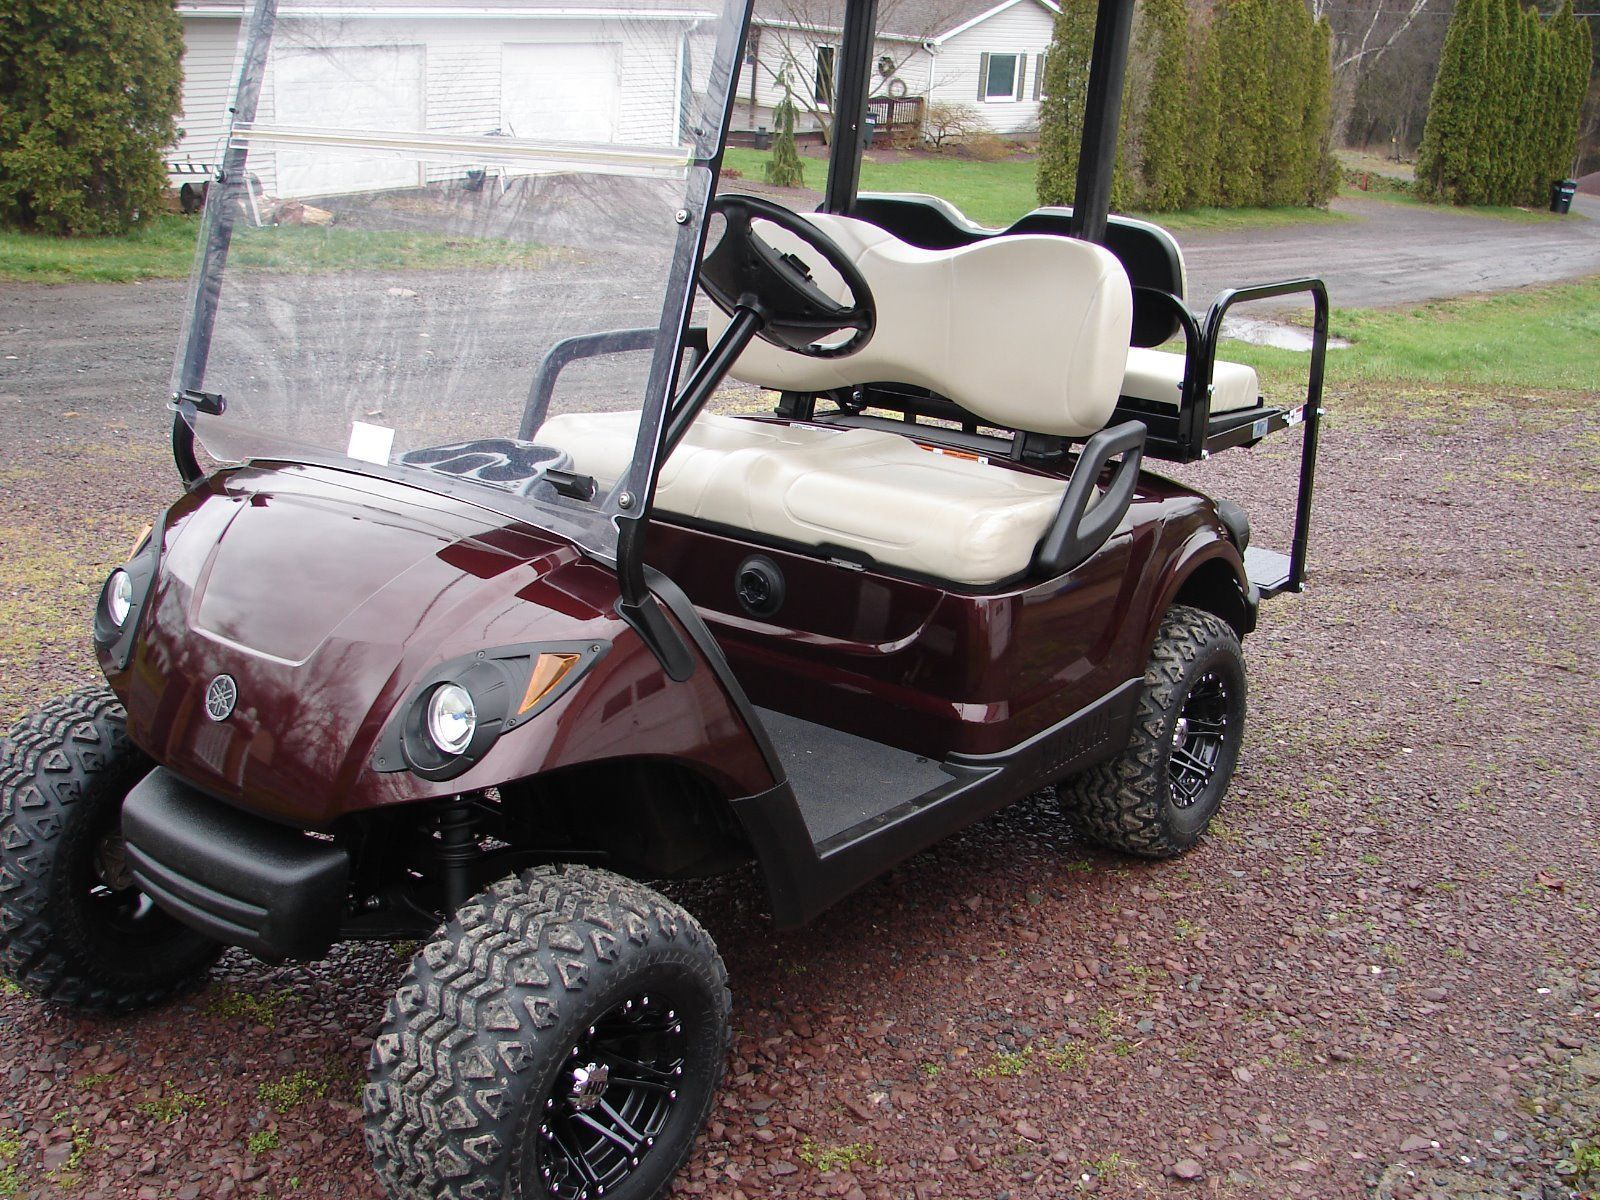 2012 Yamaha Drive G29 48V Electric Golf Cart   Golf carts